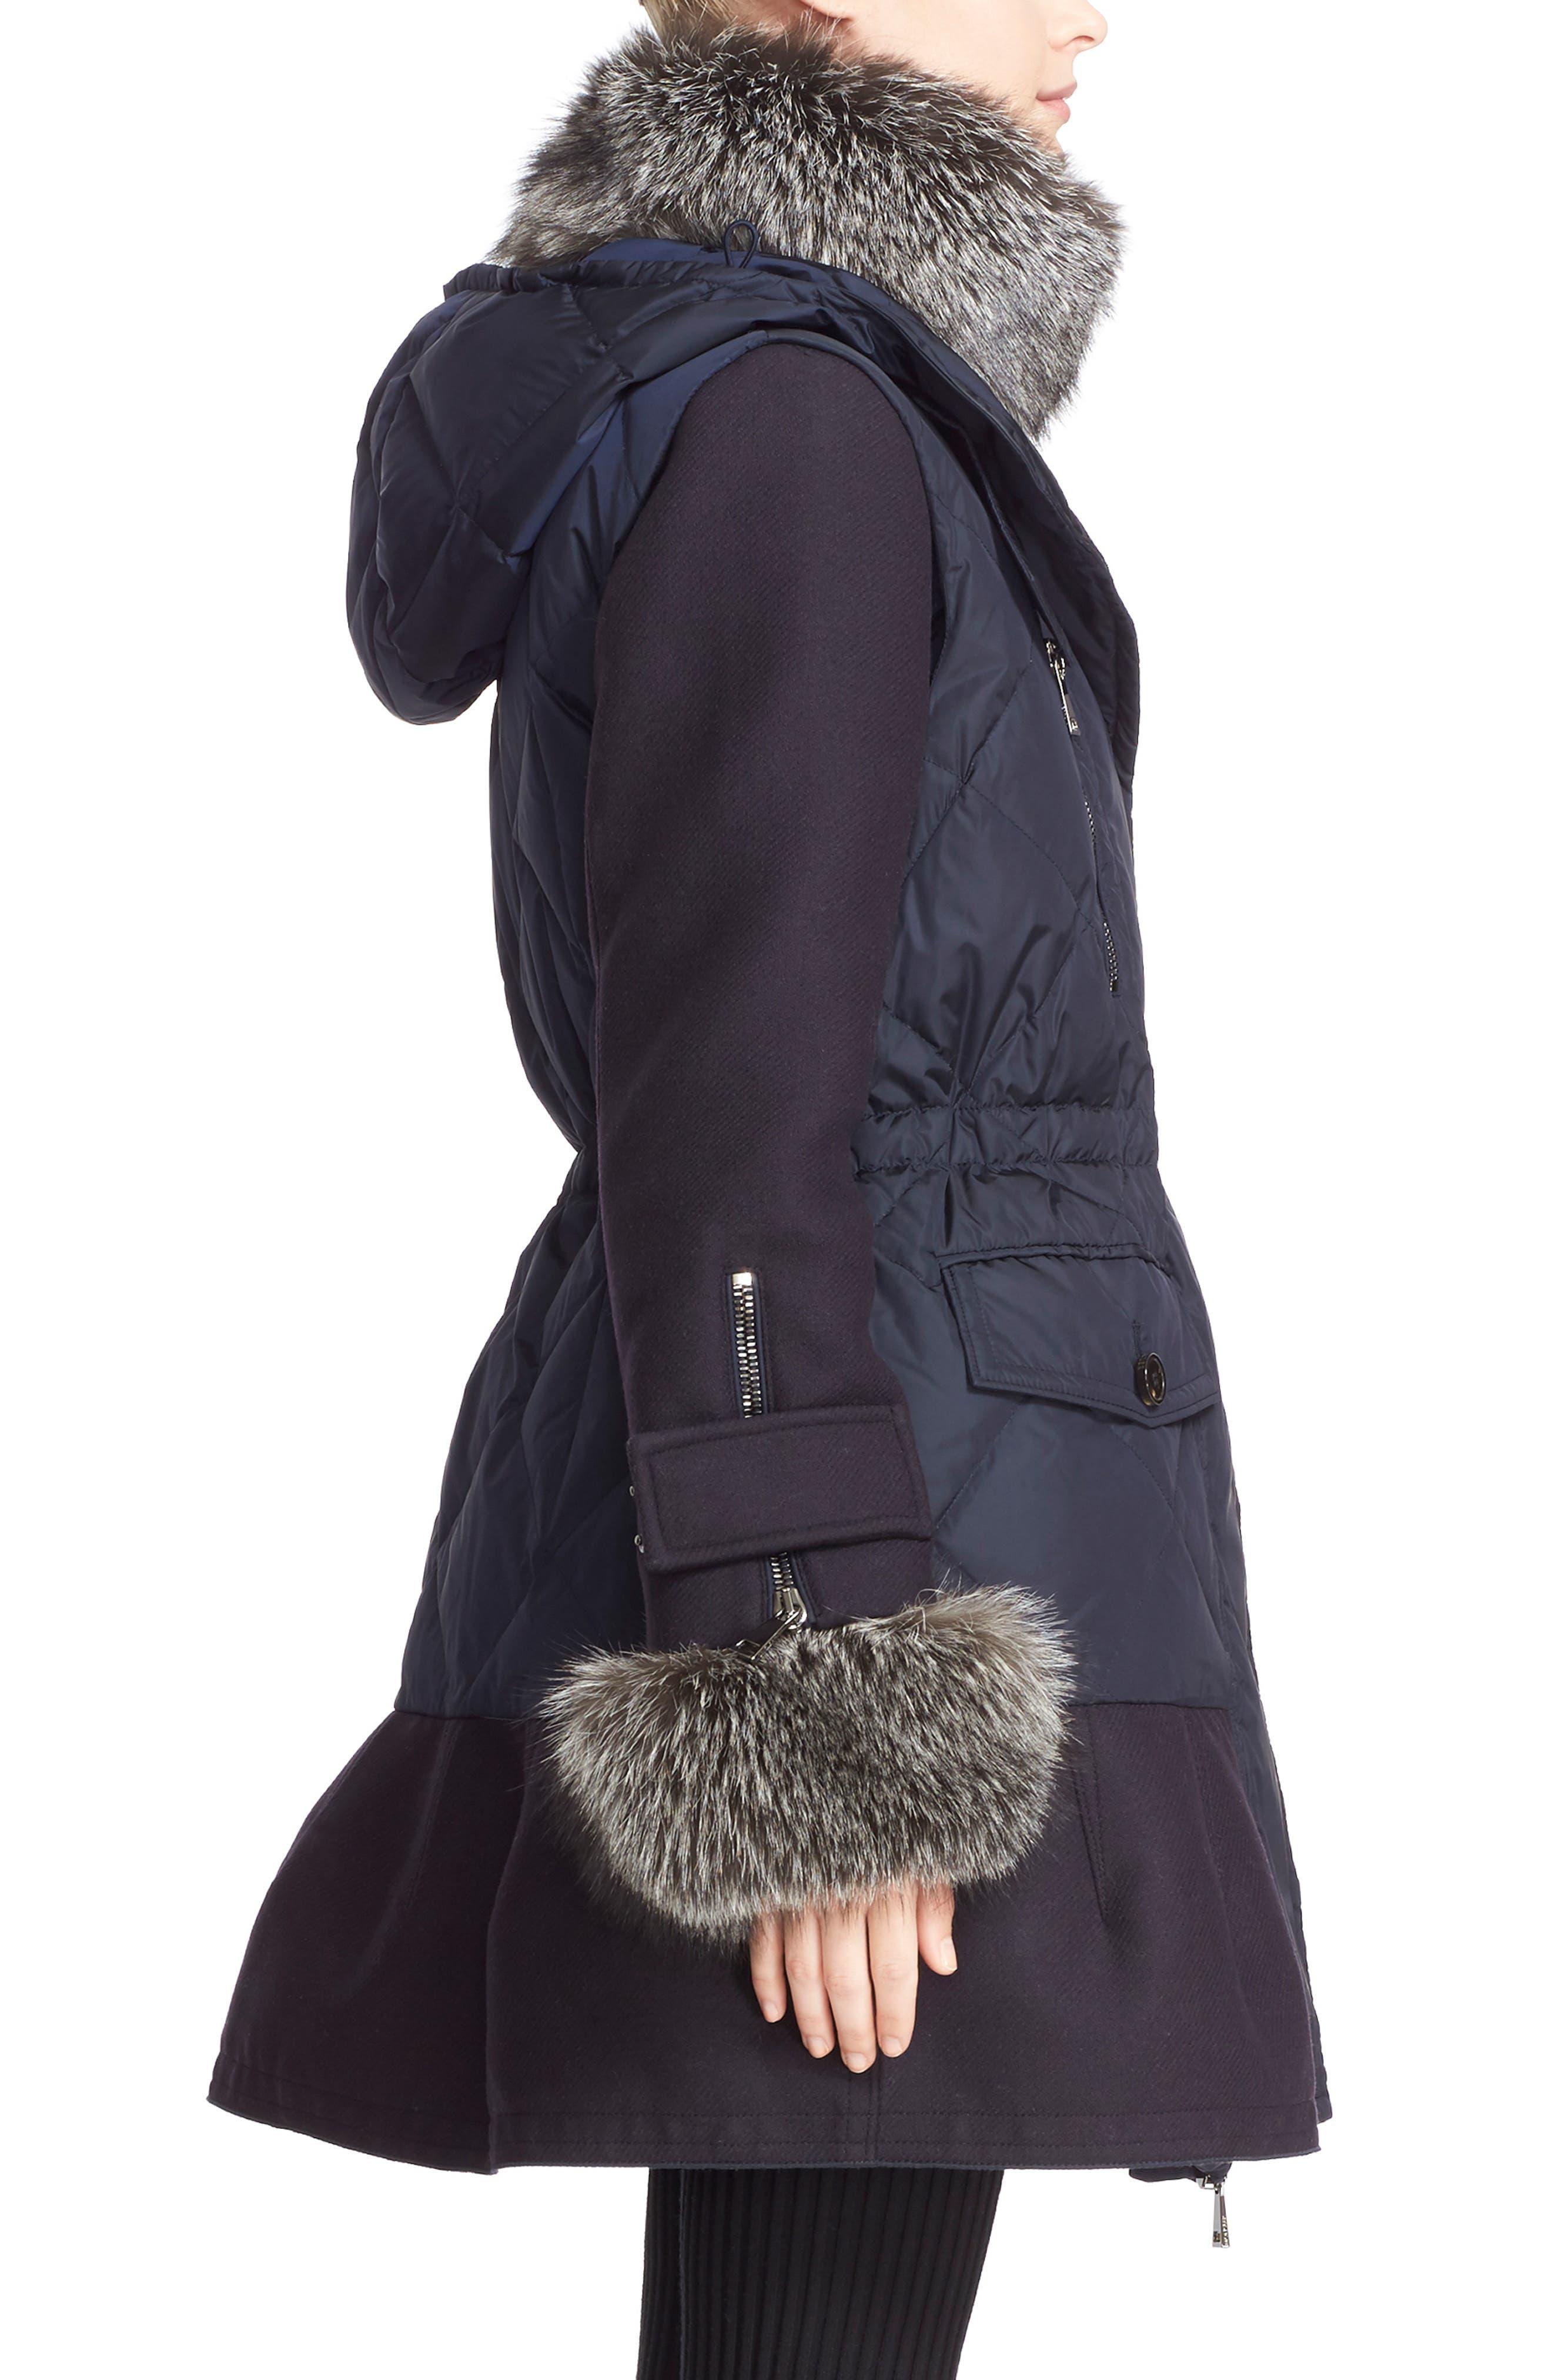 'Elestoria' Two-Piece Down Puffer Coat with Genuine Fox Fur Trim,                             Alternate thumbnail 3, color,                             419